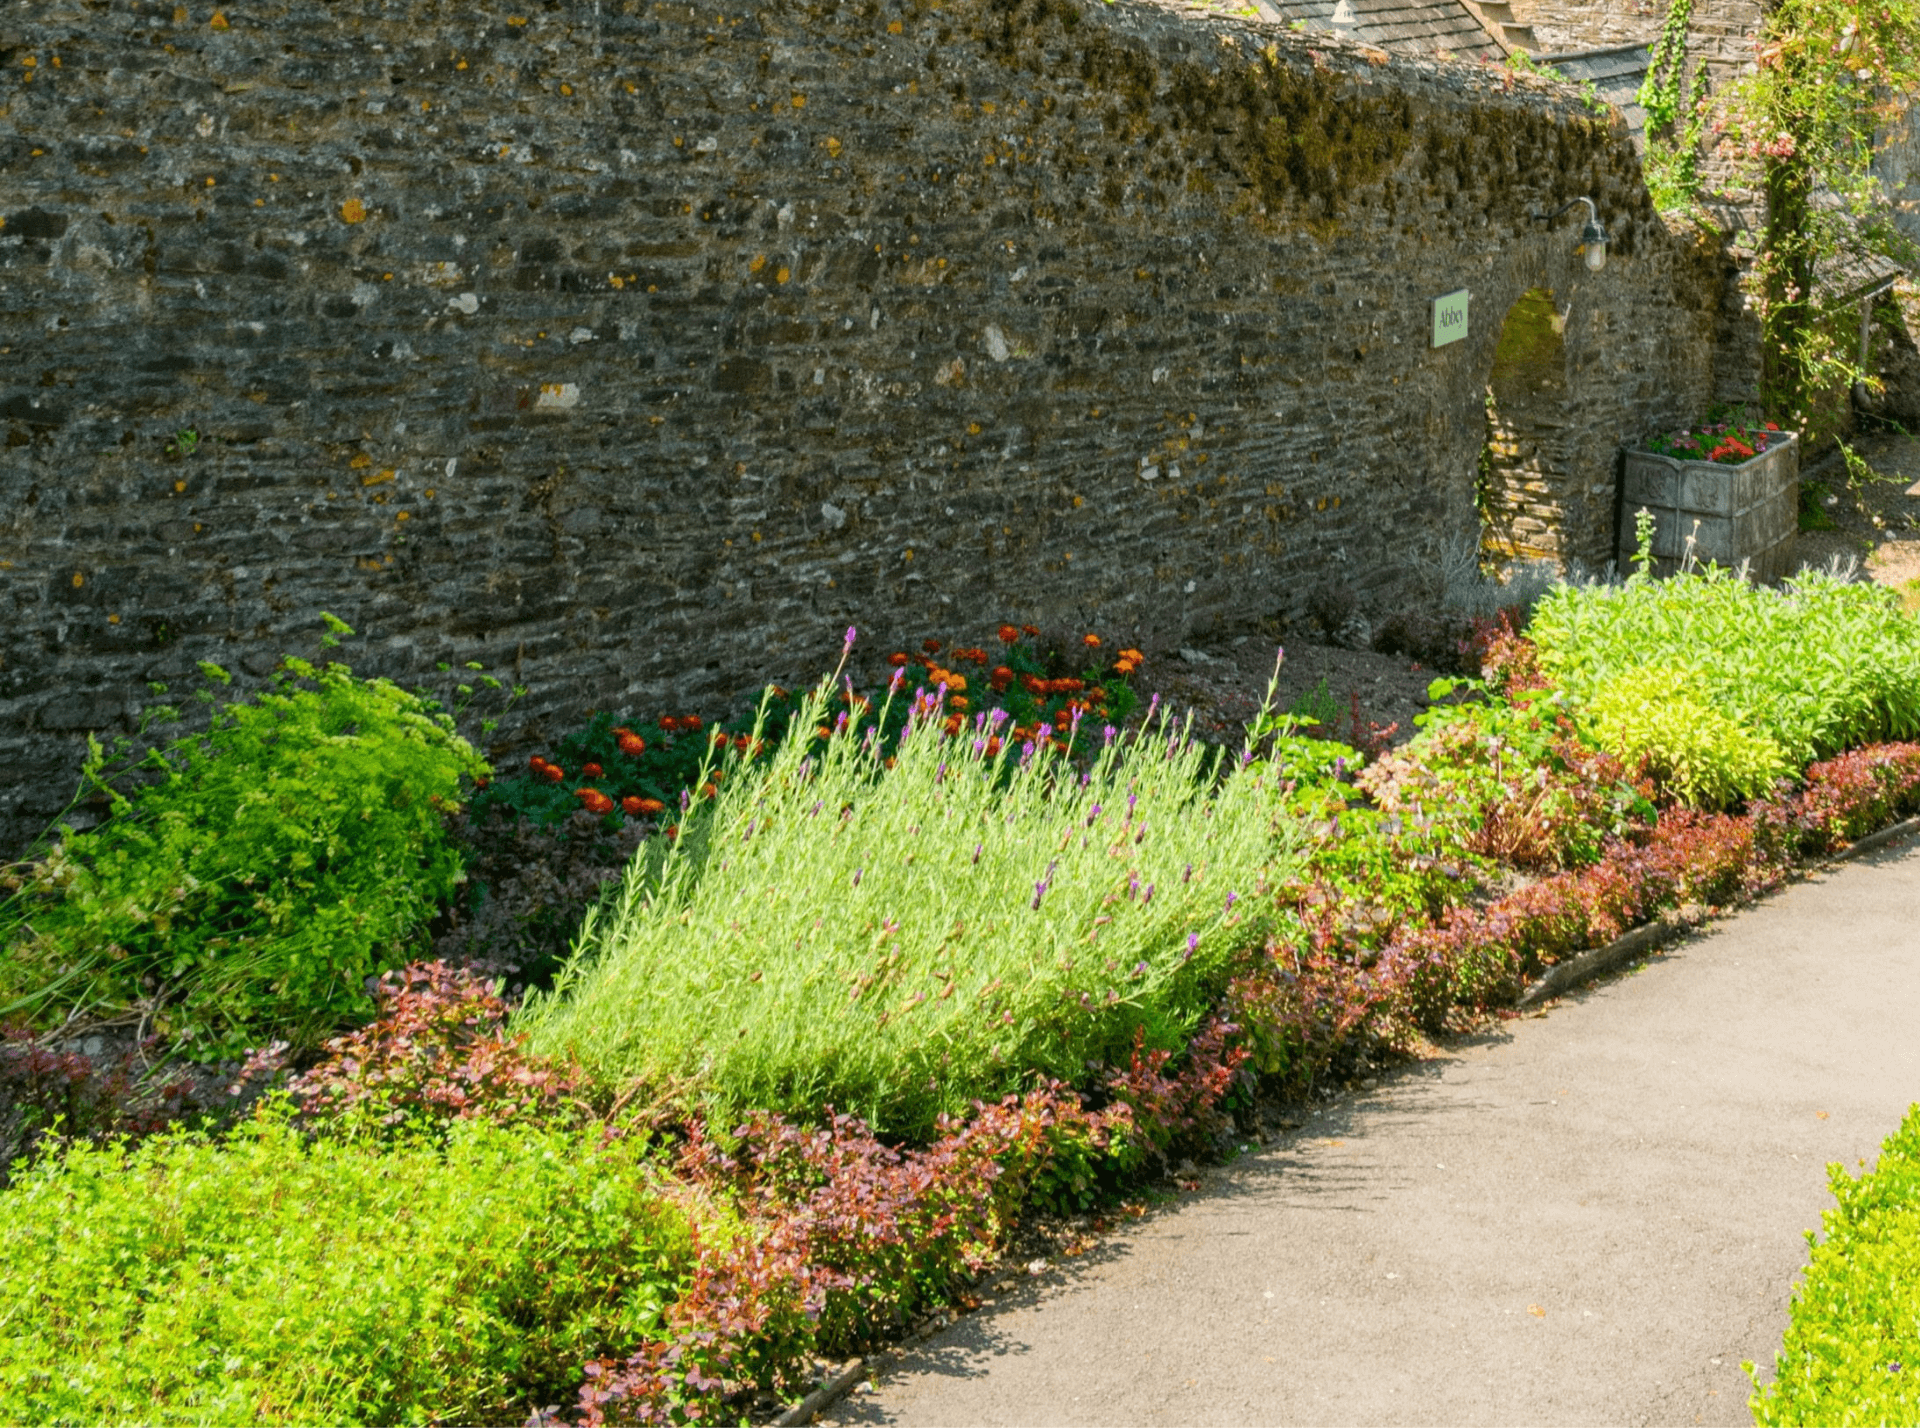 lush garden below an old, natural stone retaining wall